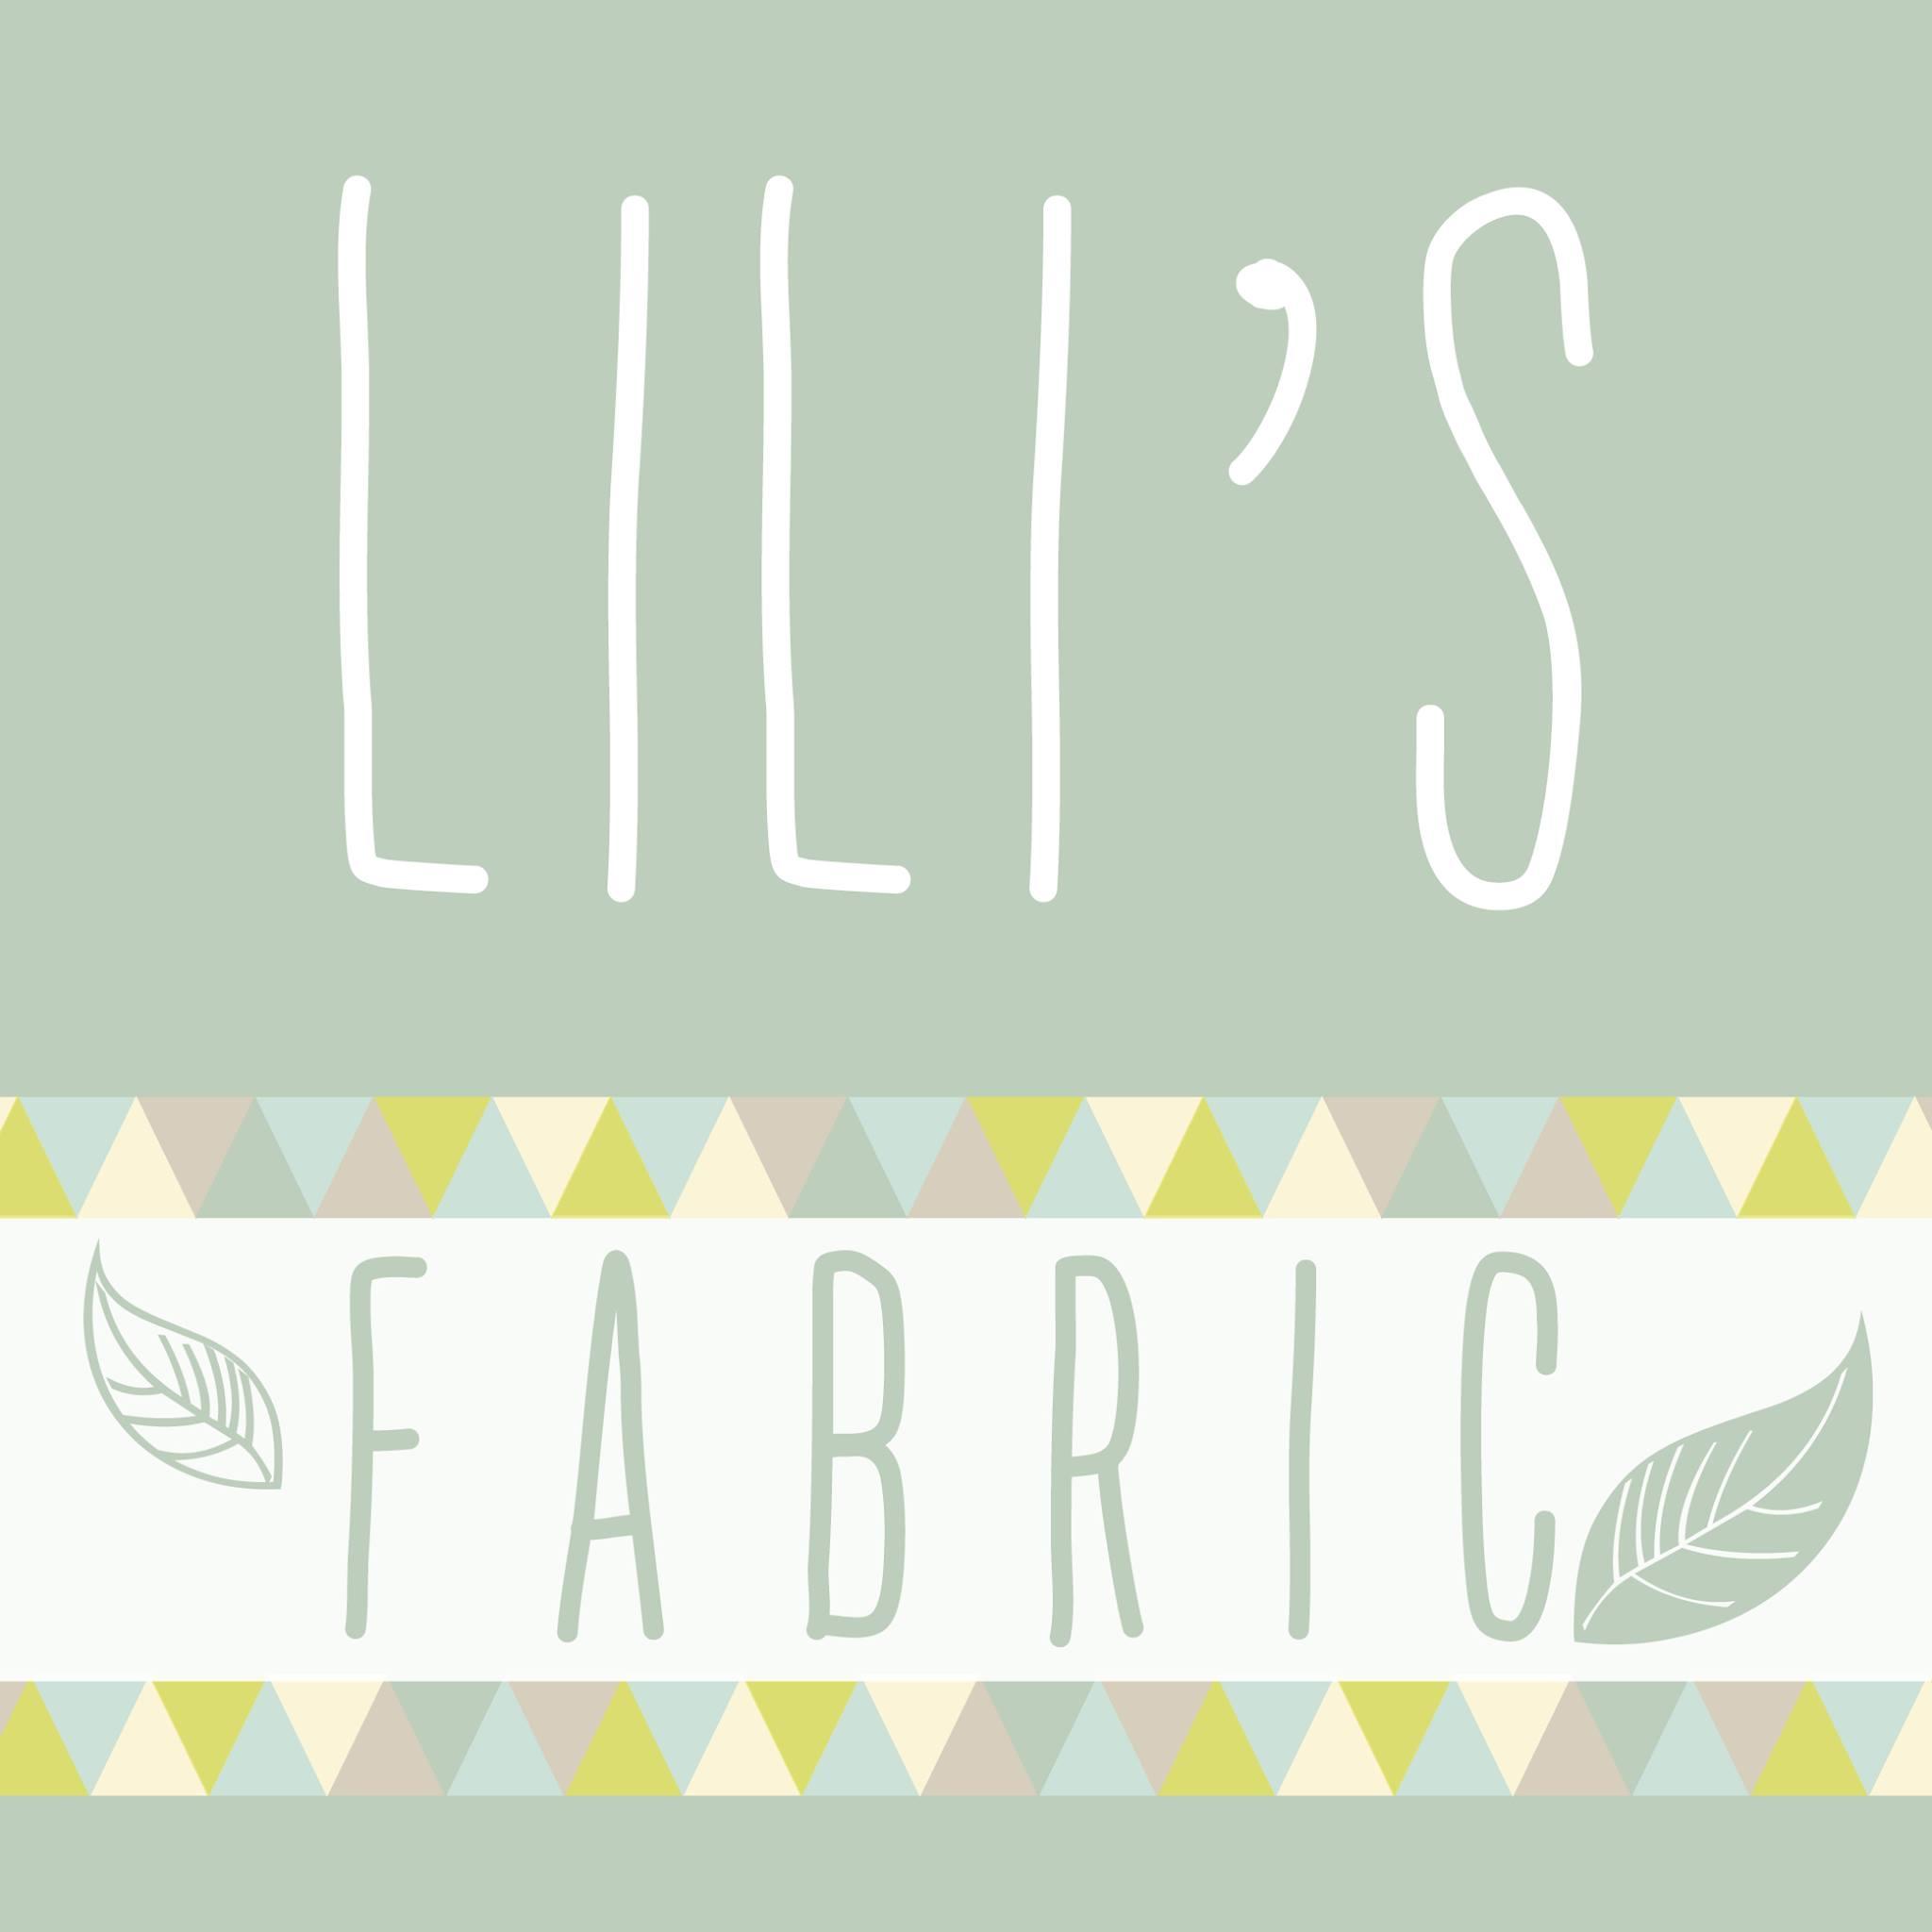 Lili's fabric